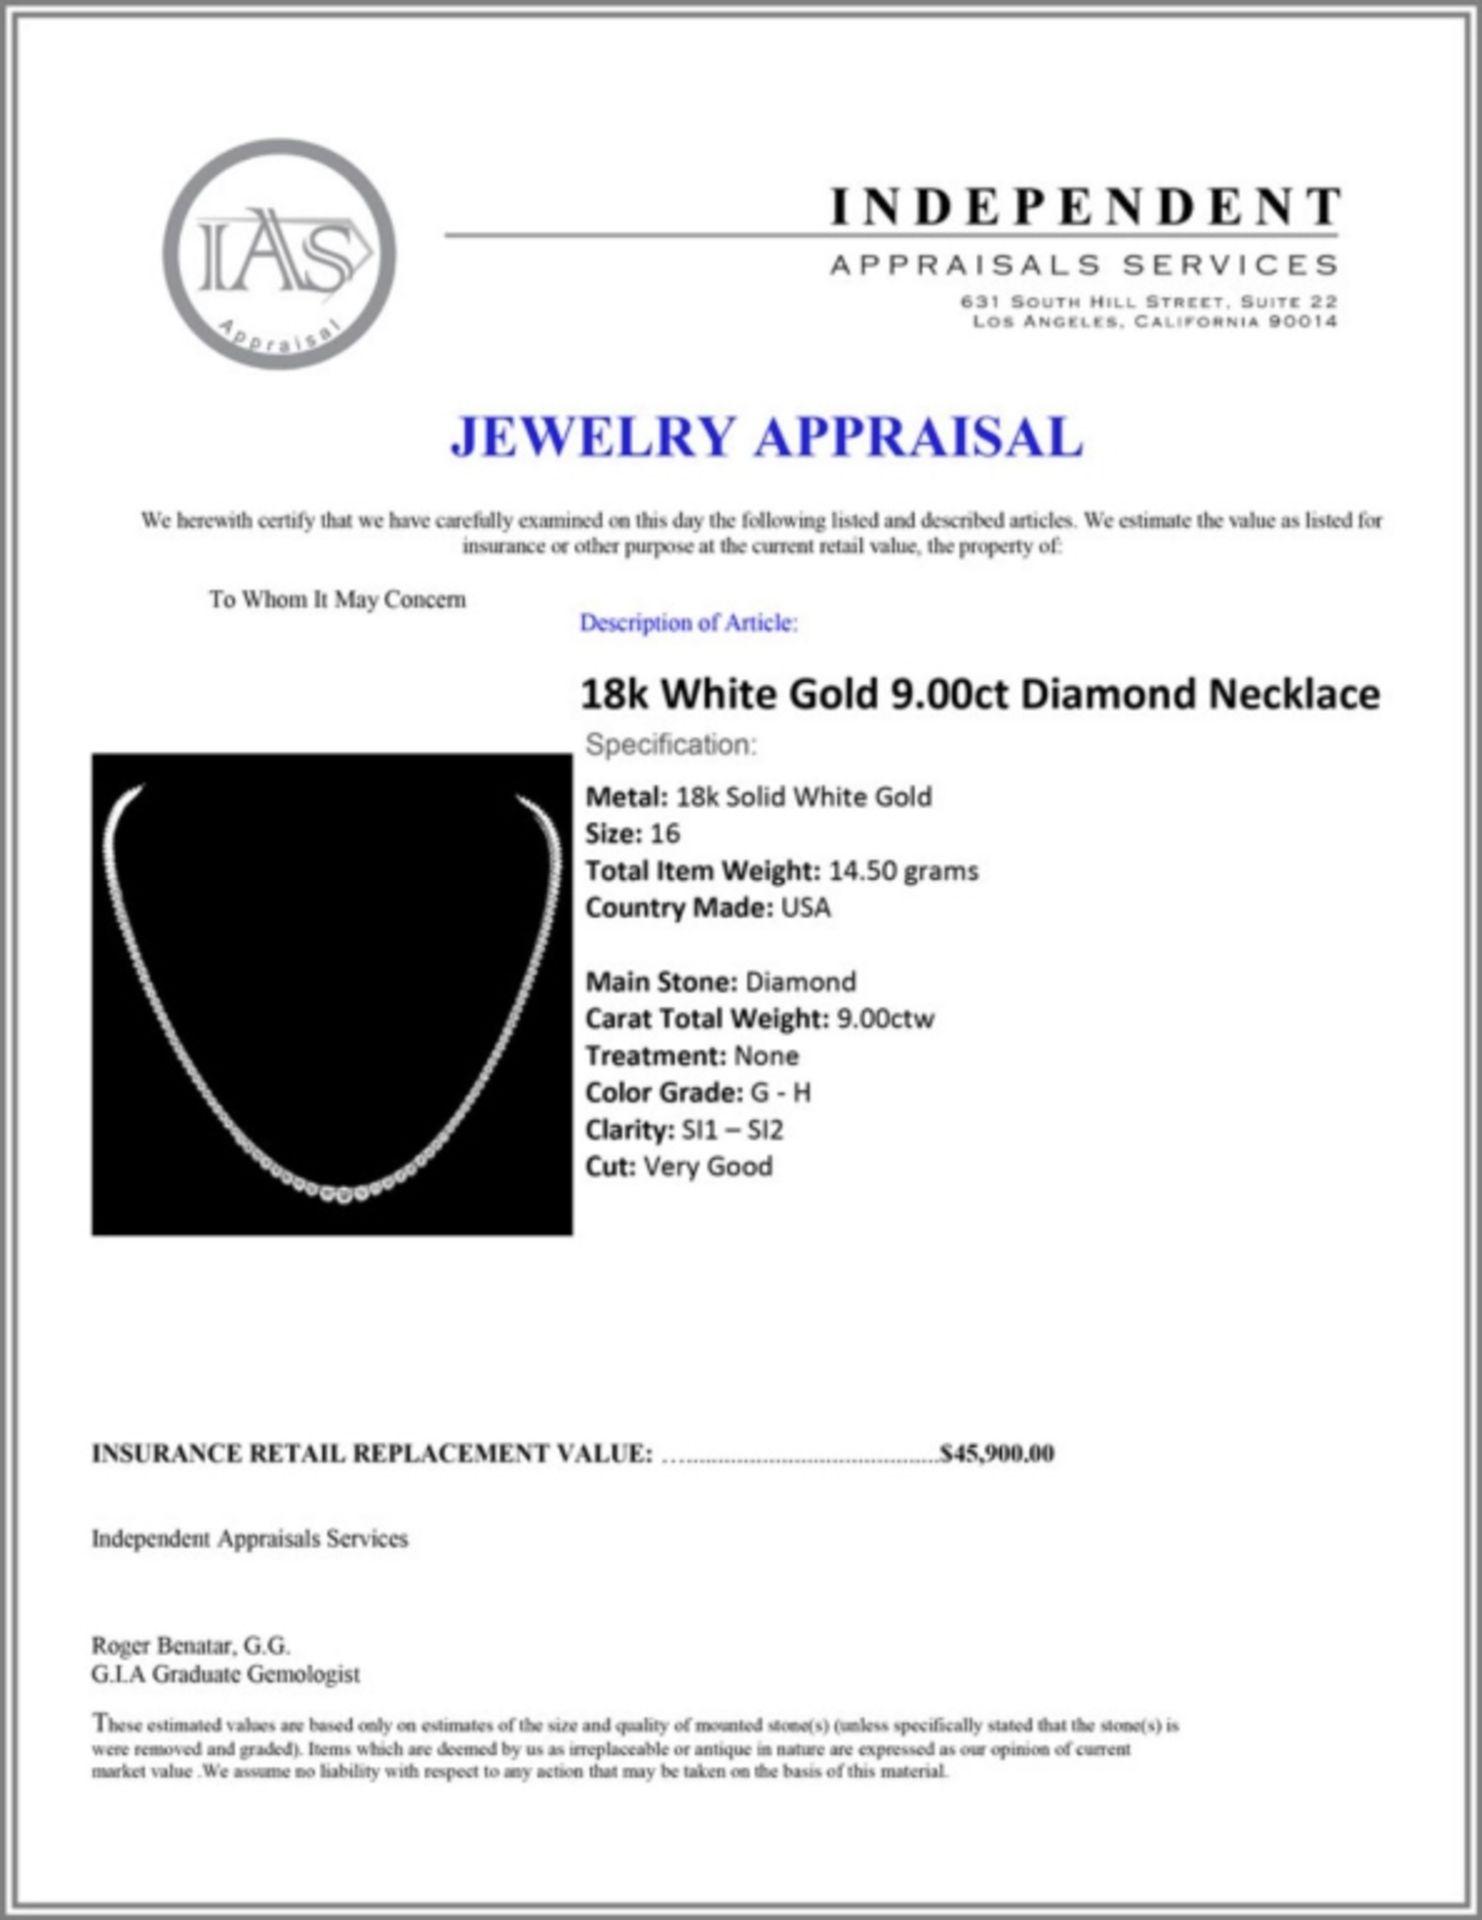 ^18k White Gold 9.00ct Diamond Necklace - Image 5 of 5